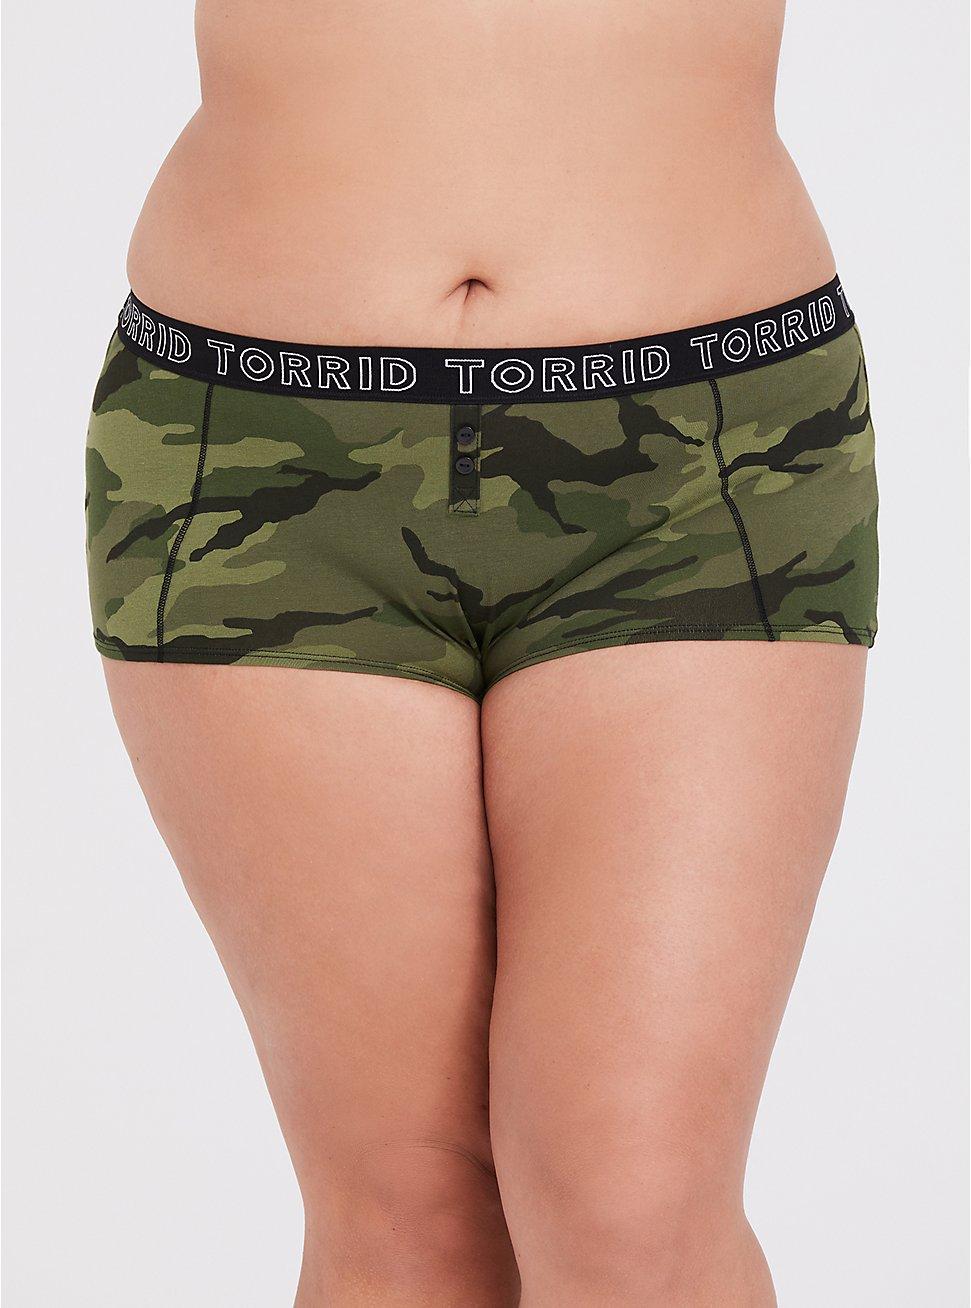 Torrid Logo Camo Print Cotton Boyshort Panty, CAMO-GREEN, hi-res